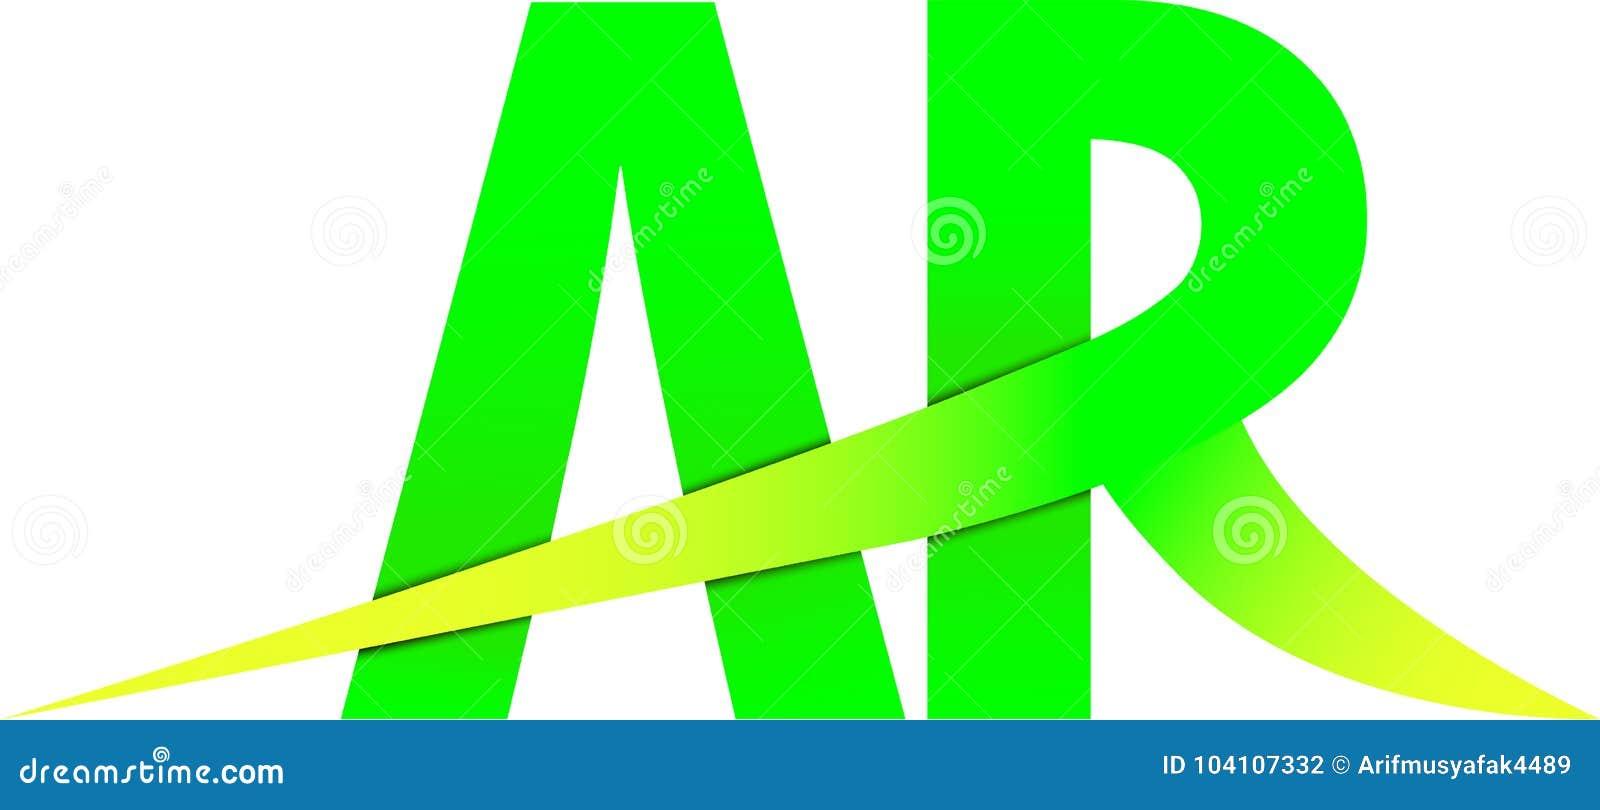 AR A R Logo Green Yellow Design Stock Illustration - Illustration of ...